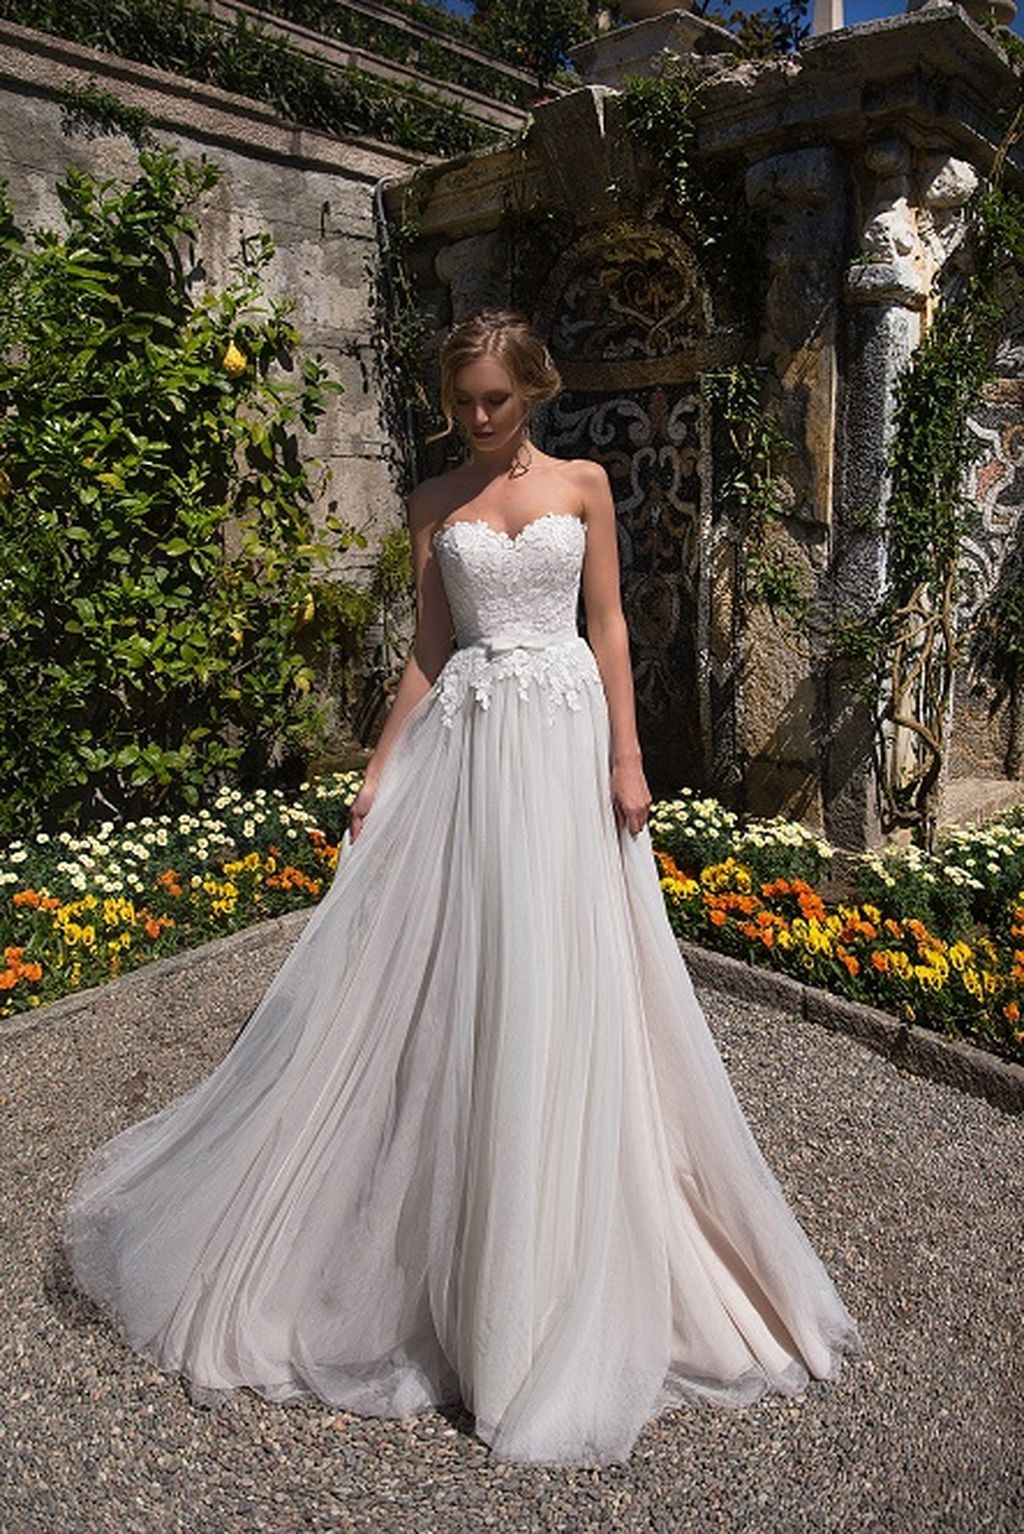 56 Beautiful Pastel Wedding Gowns Design Ideas | Gowns, Wedding ...